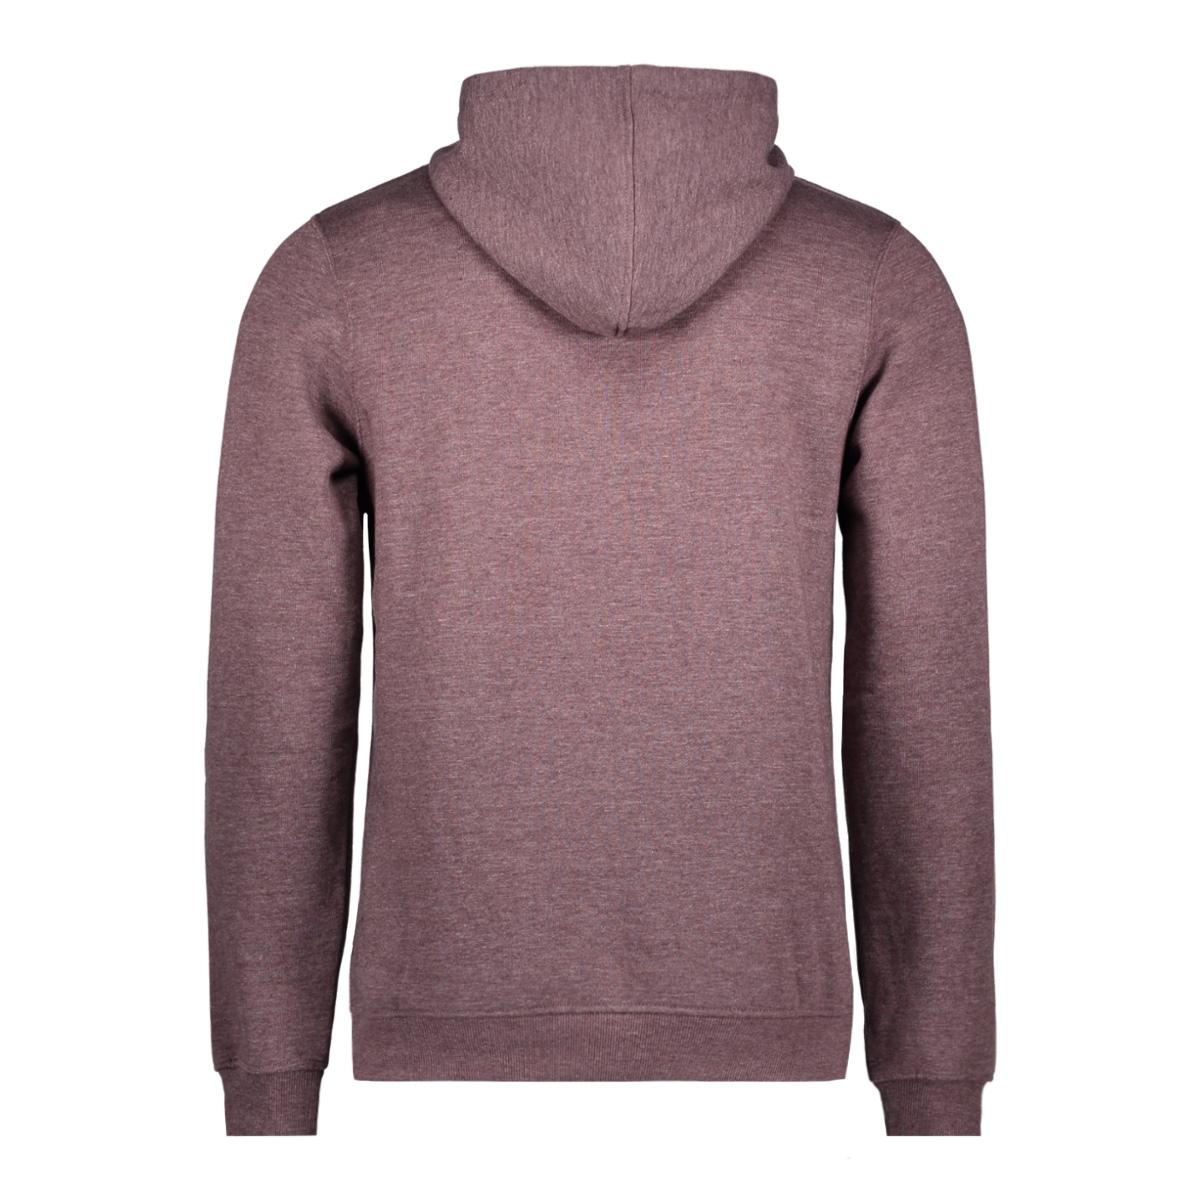 jcolano sweat hood bf 12128568 jack & jones sweater fudge